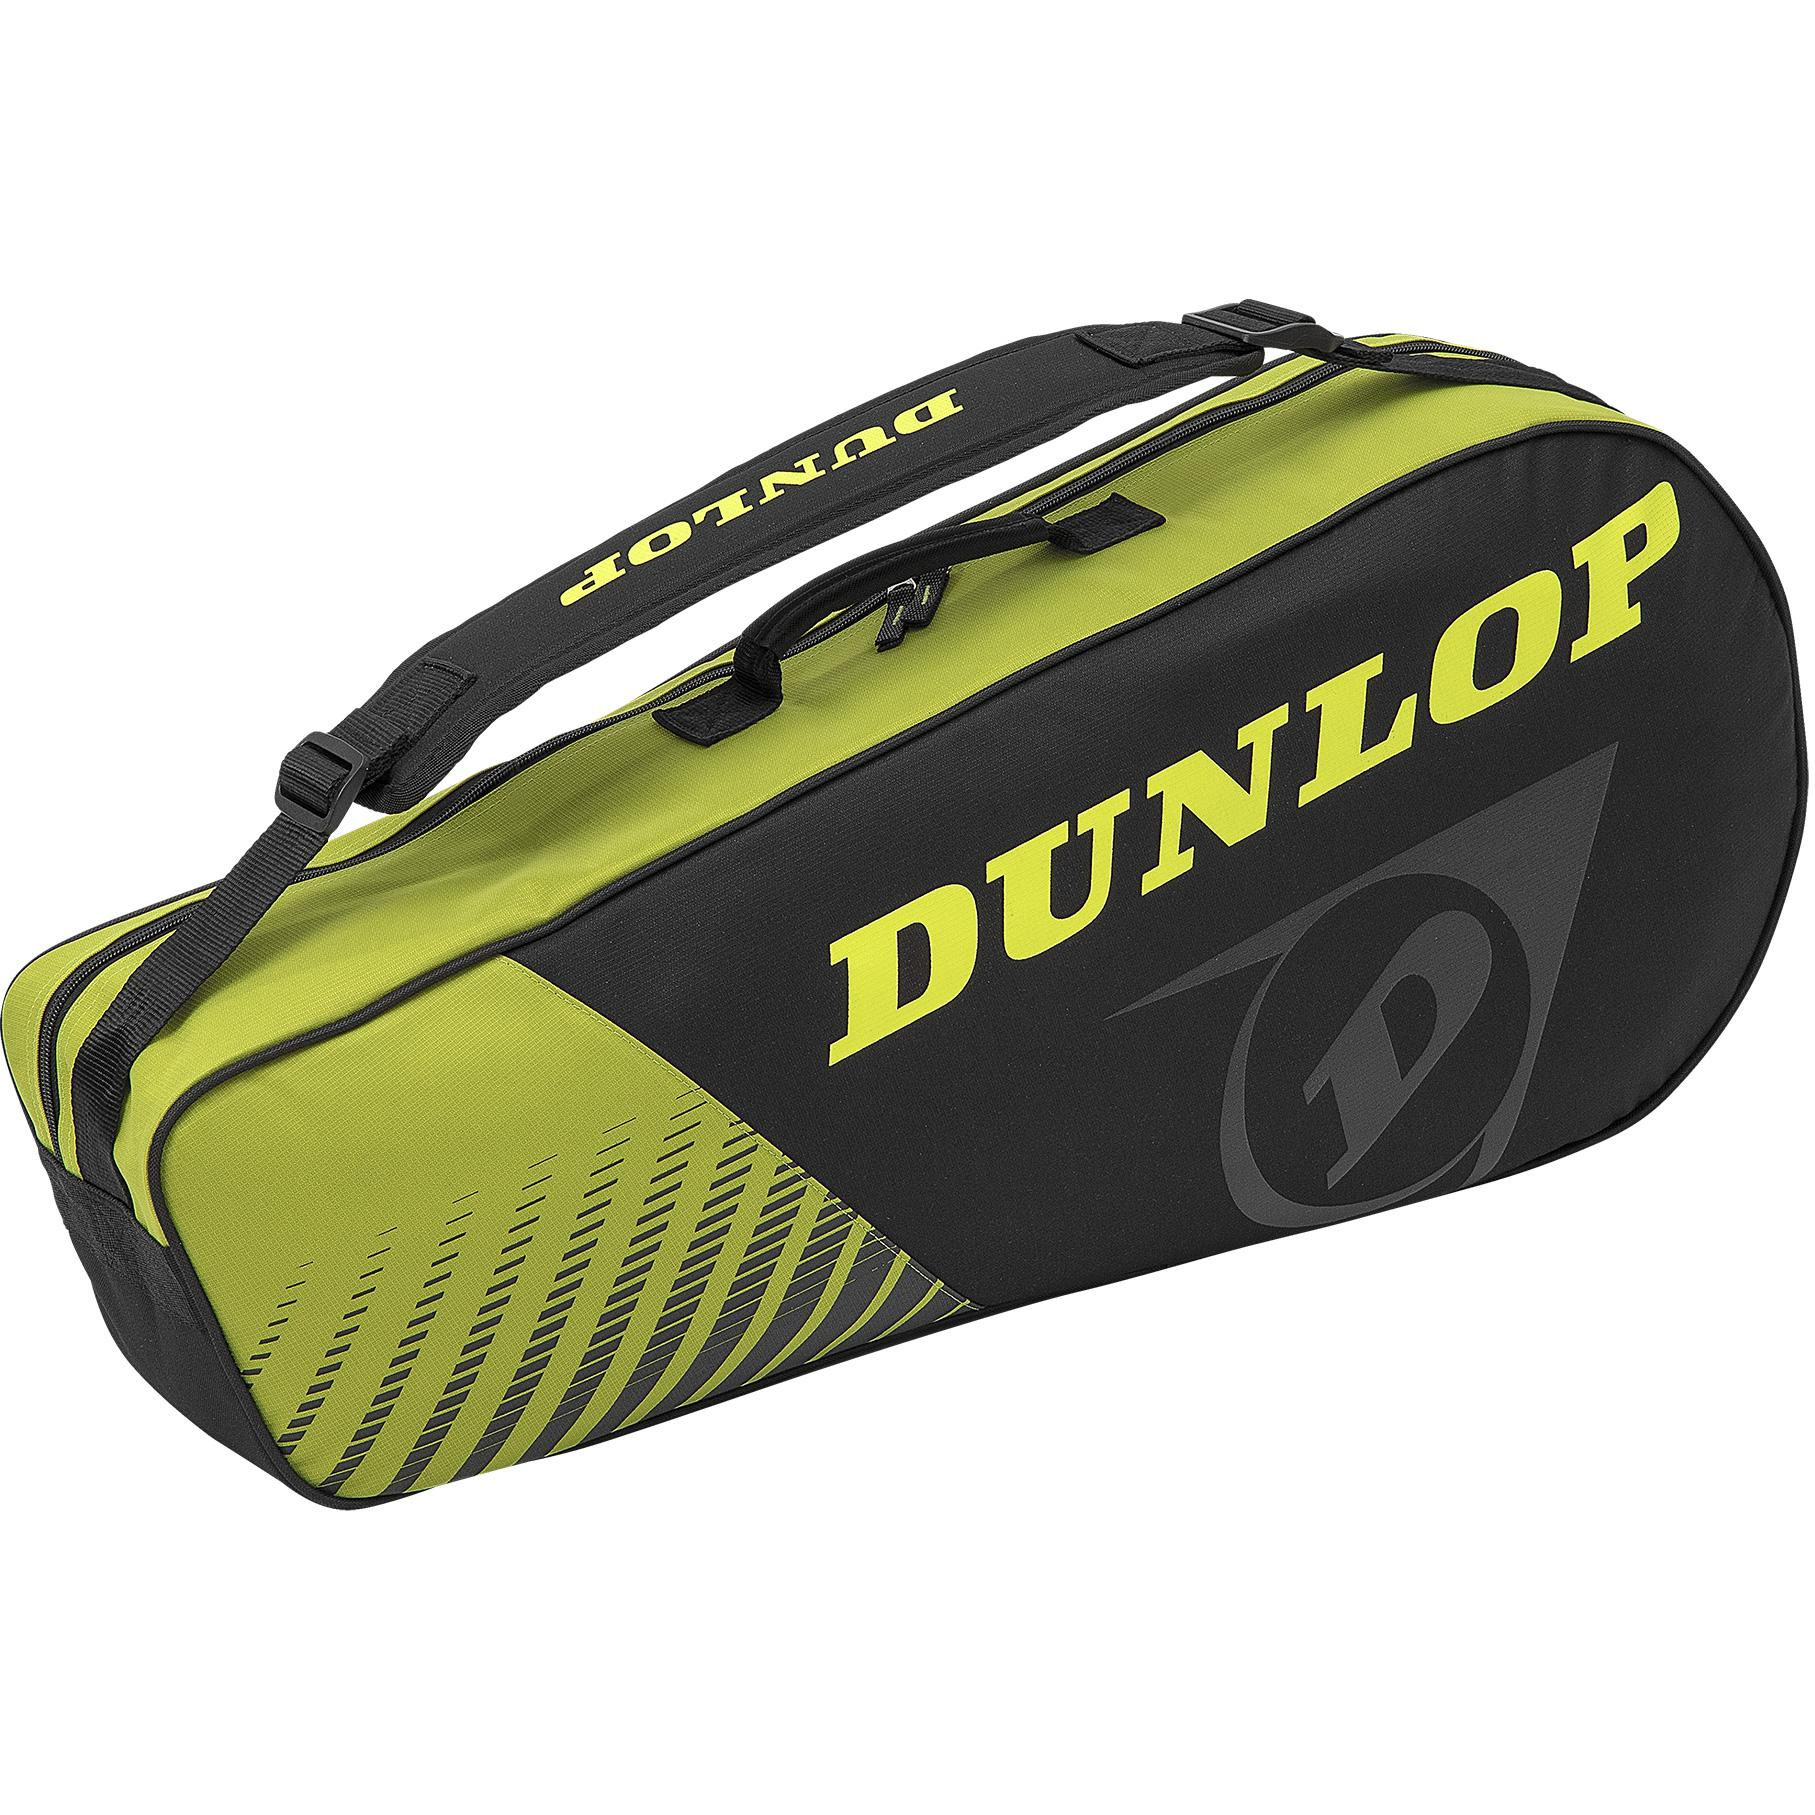 DUNLOP CX Club 3 Racket Thermo Tennis Bag